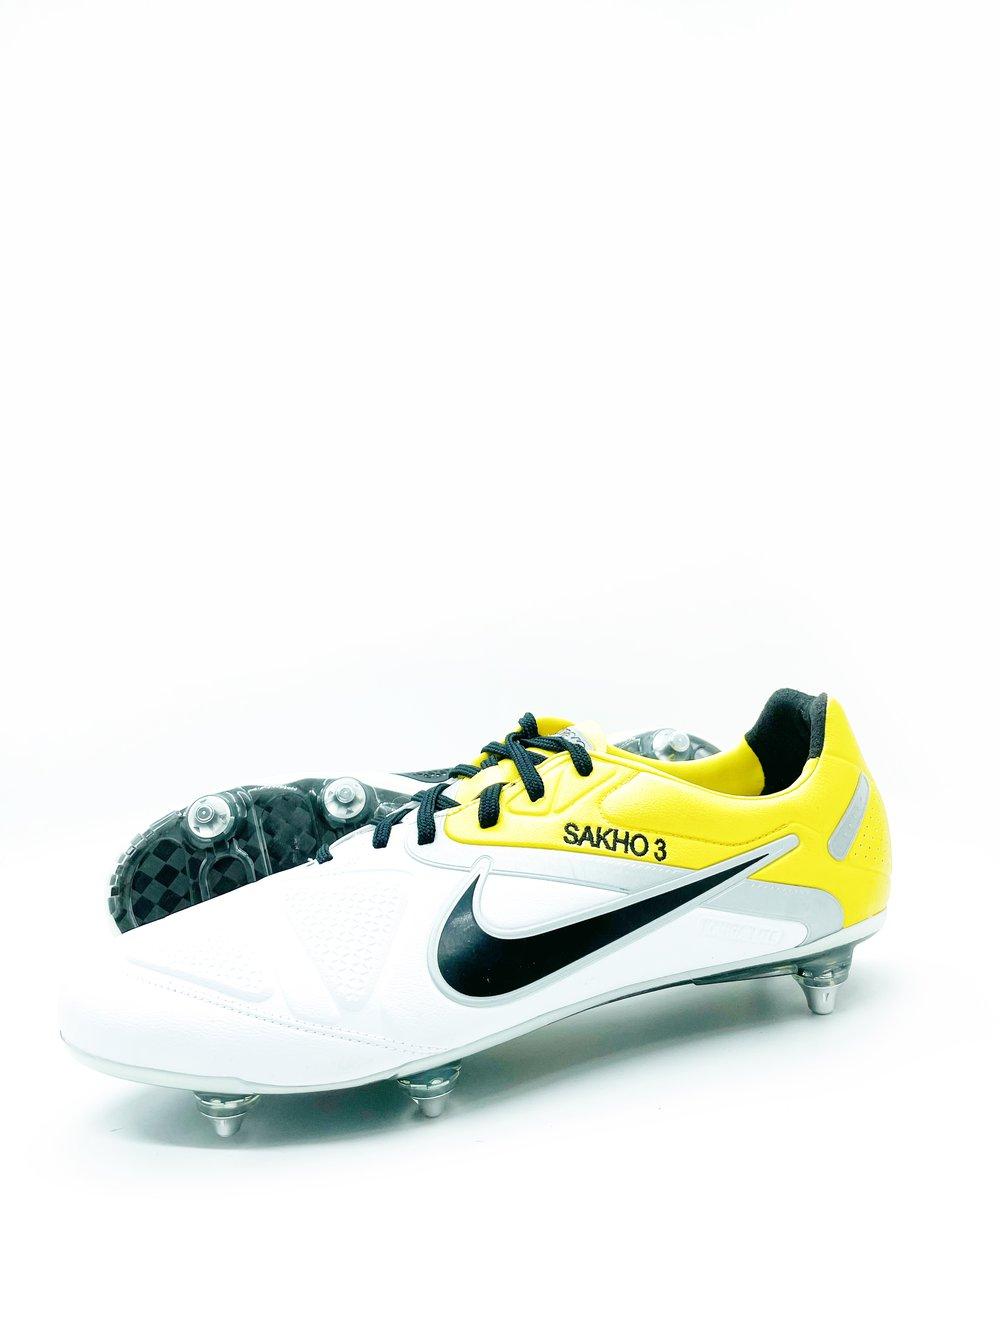 Image of Nike Ctr360 Maestri Sg Elite yellow